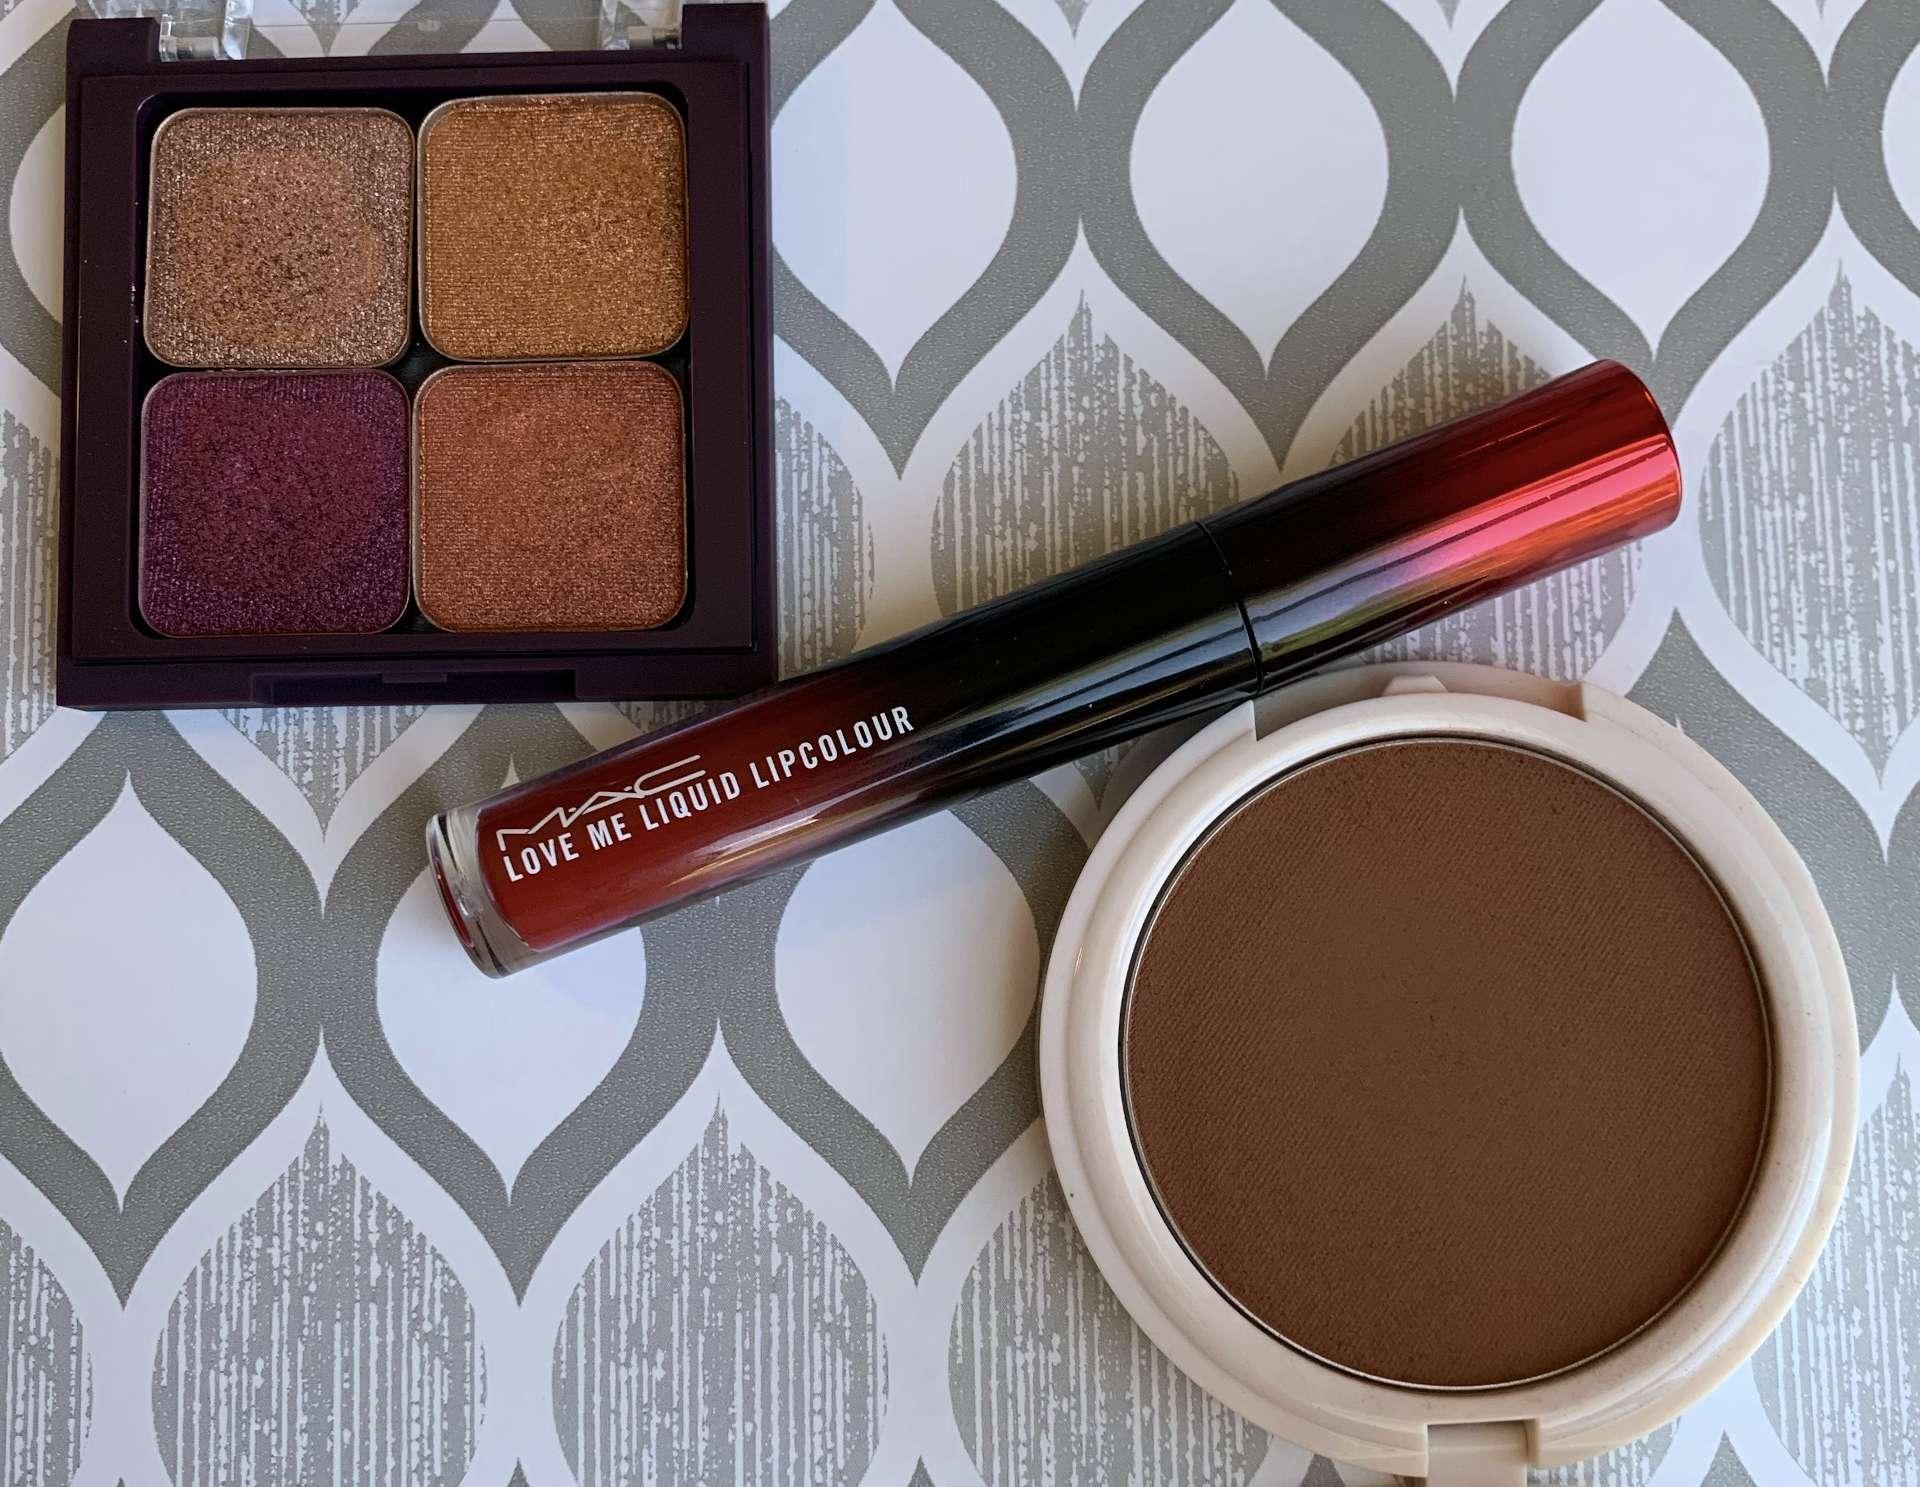 Coloured Raine Cinna-Bae Bronzer, MAC Love Me Liquid Lip Color E for Effortless, and Makeup Geek Foiled Eyeshadows